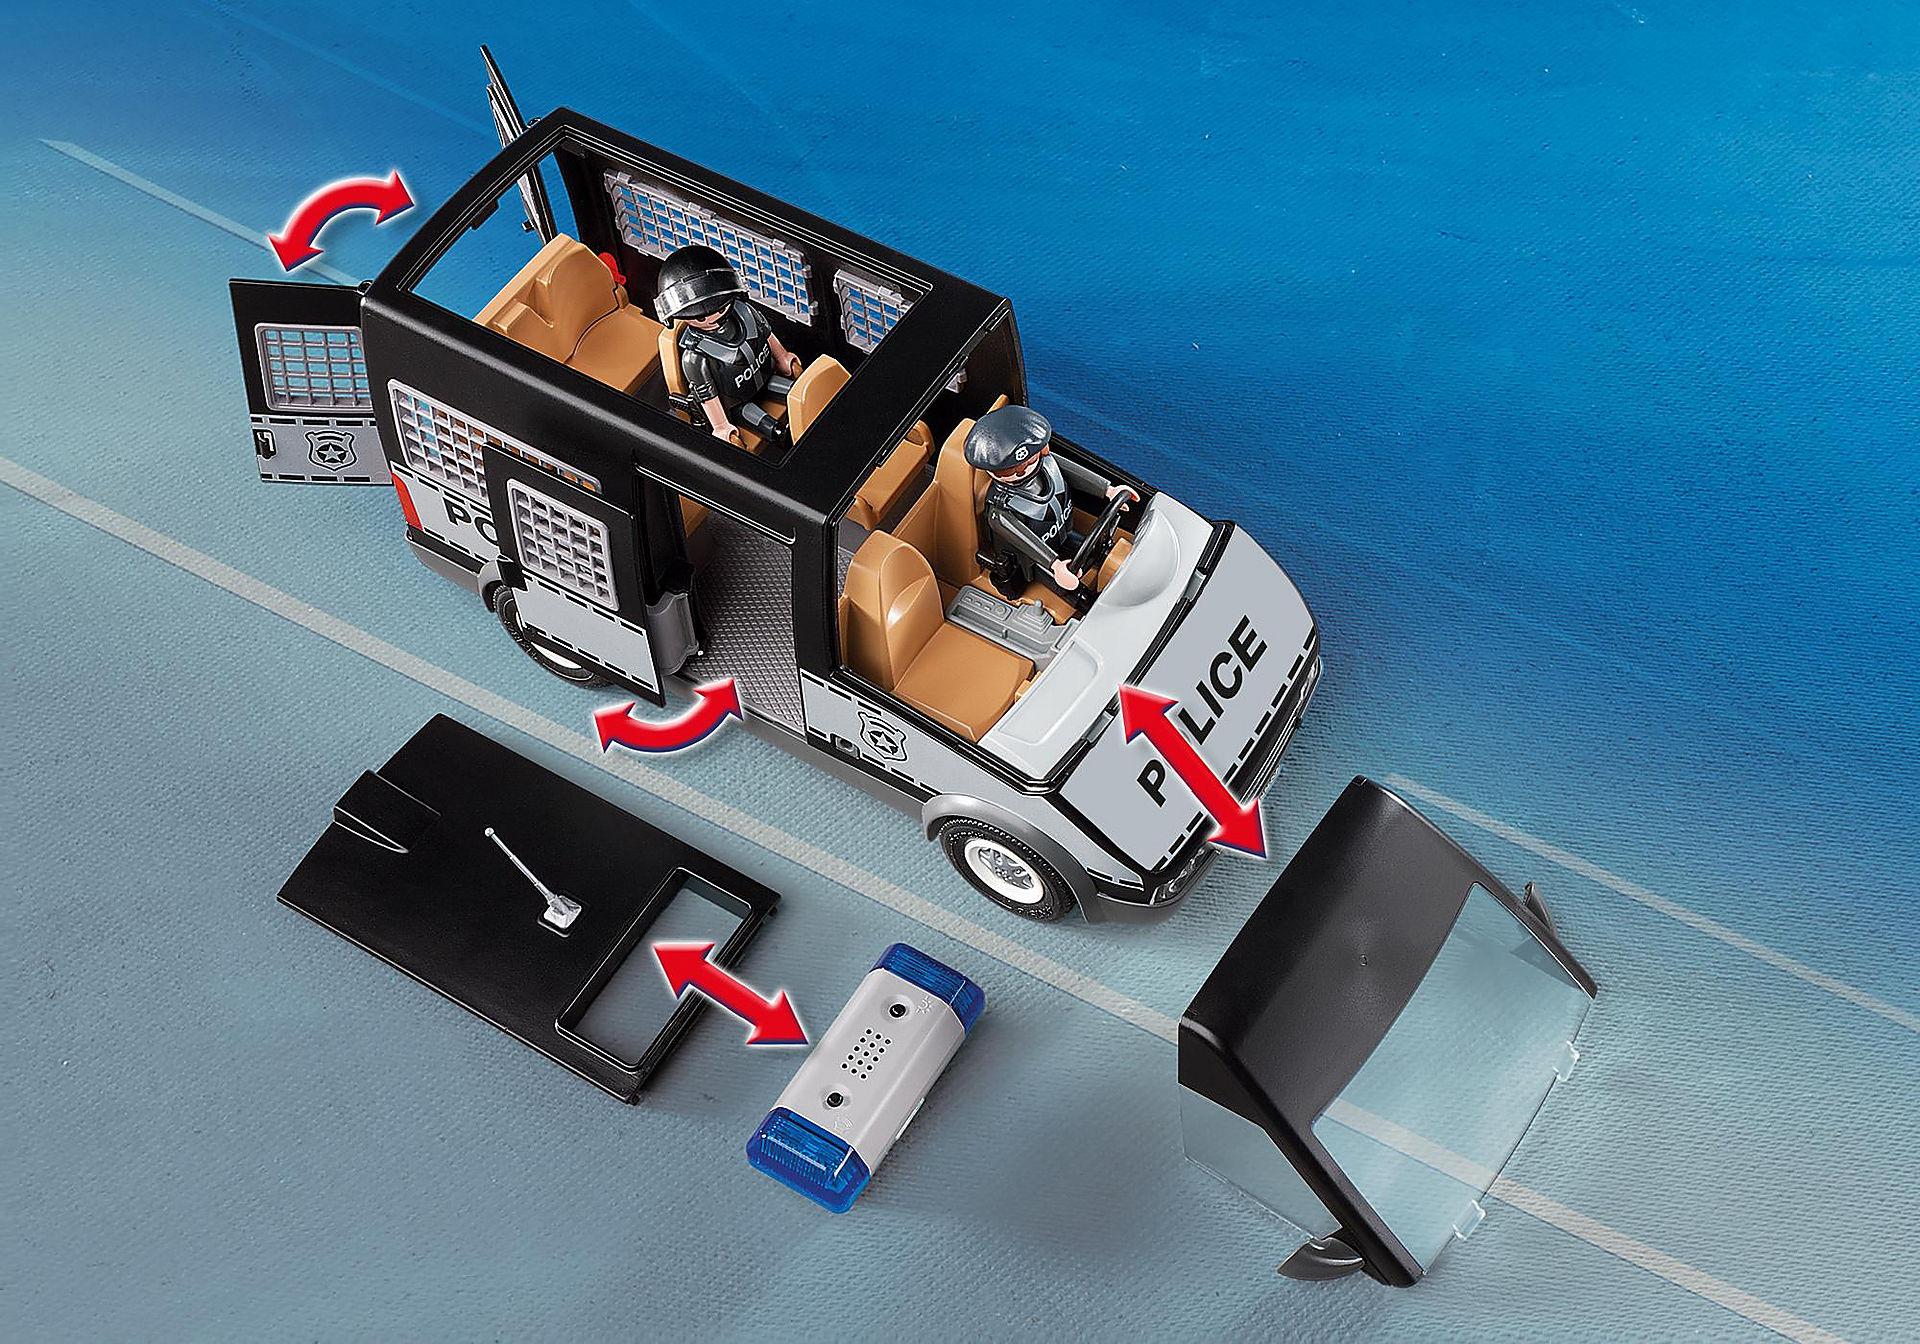 http://media.playmobil.com/i/playmobil/6043_product_extra2/Furgón de Policía con Luces y Sonido